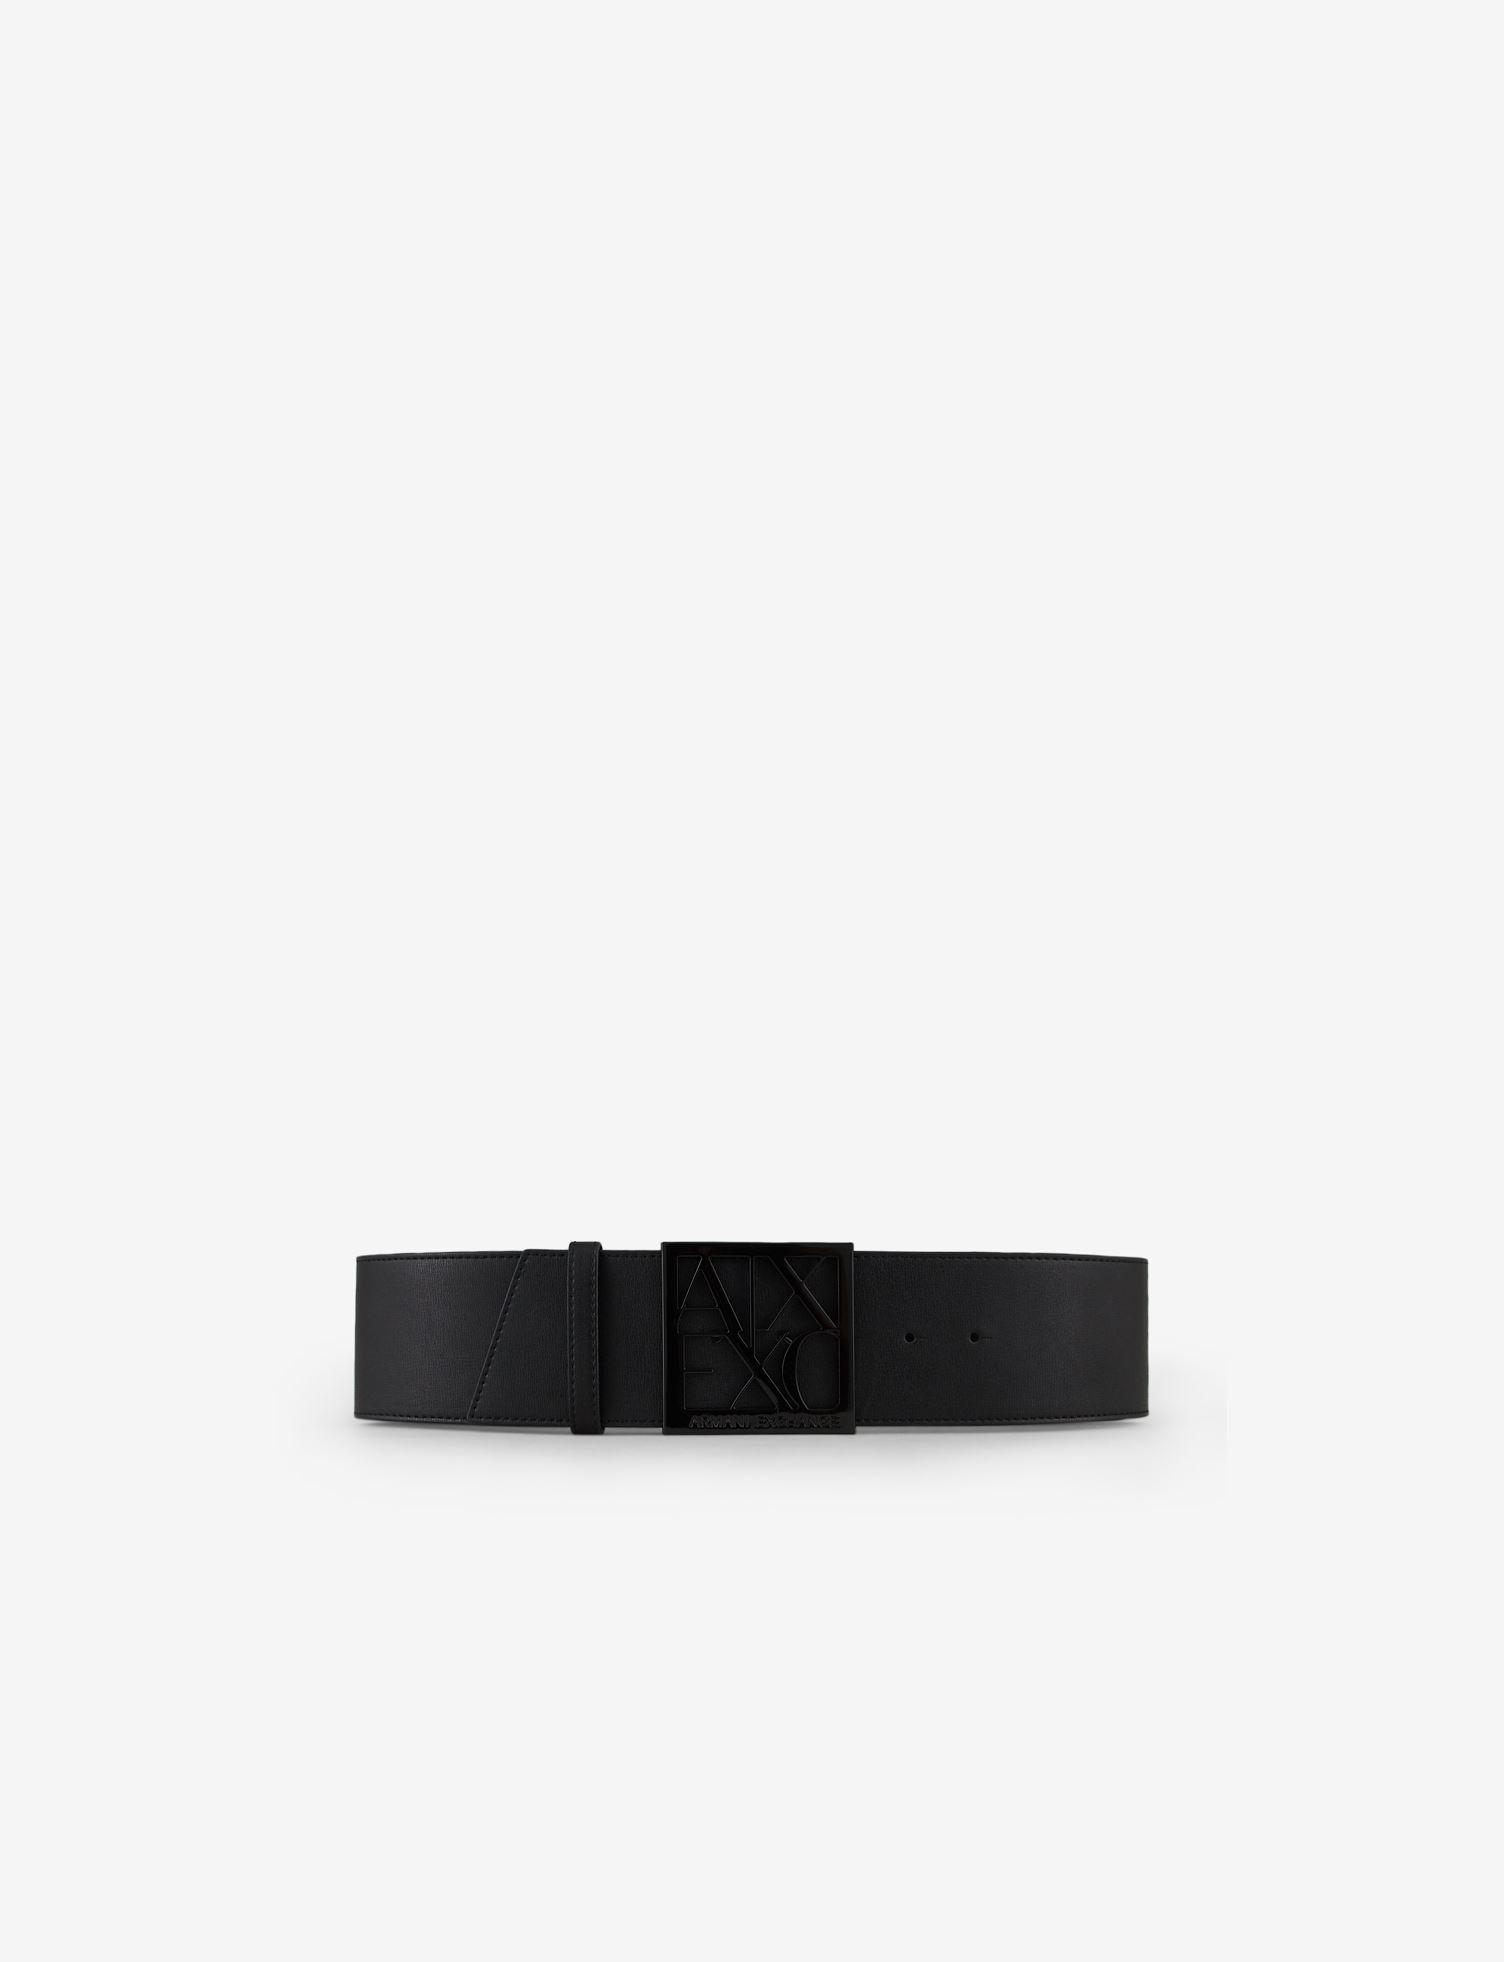 Cintura larga Armani exchange ARMANI EXCHANGE   Cintura   941132-0A87400020